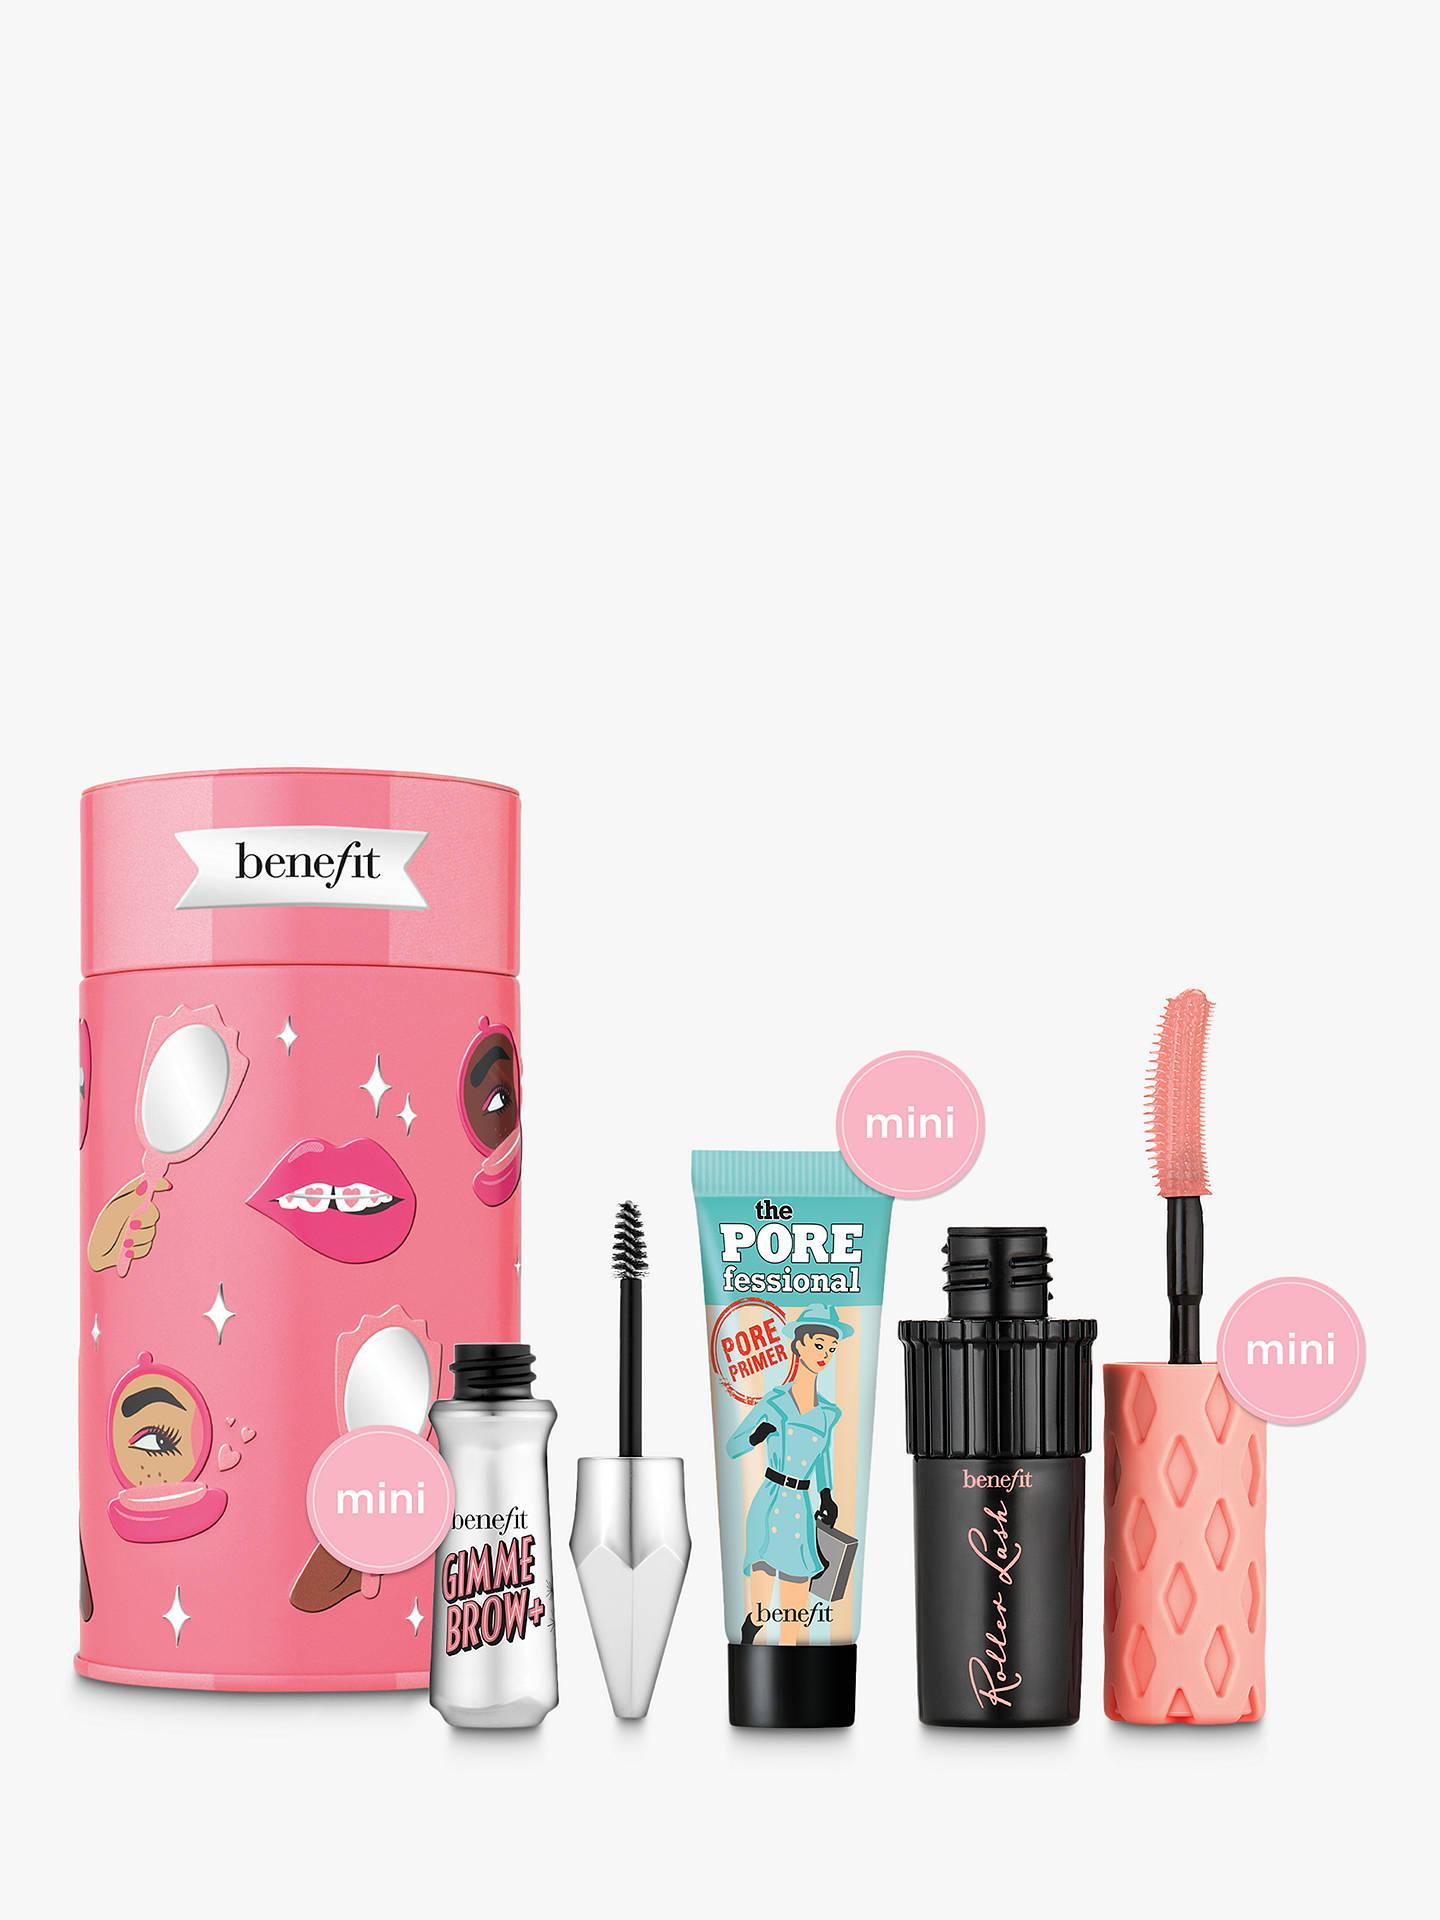 Benefit Beauty Thrills Makeup Gift Set